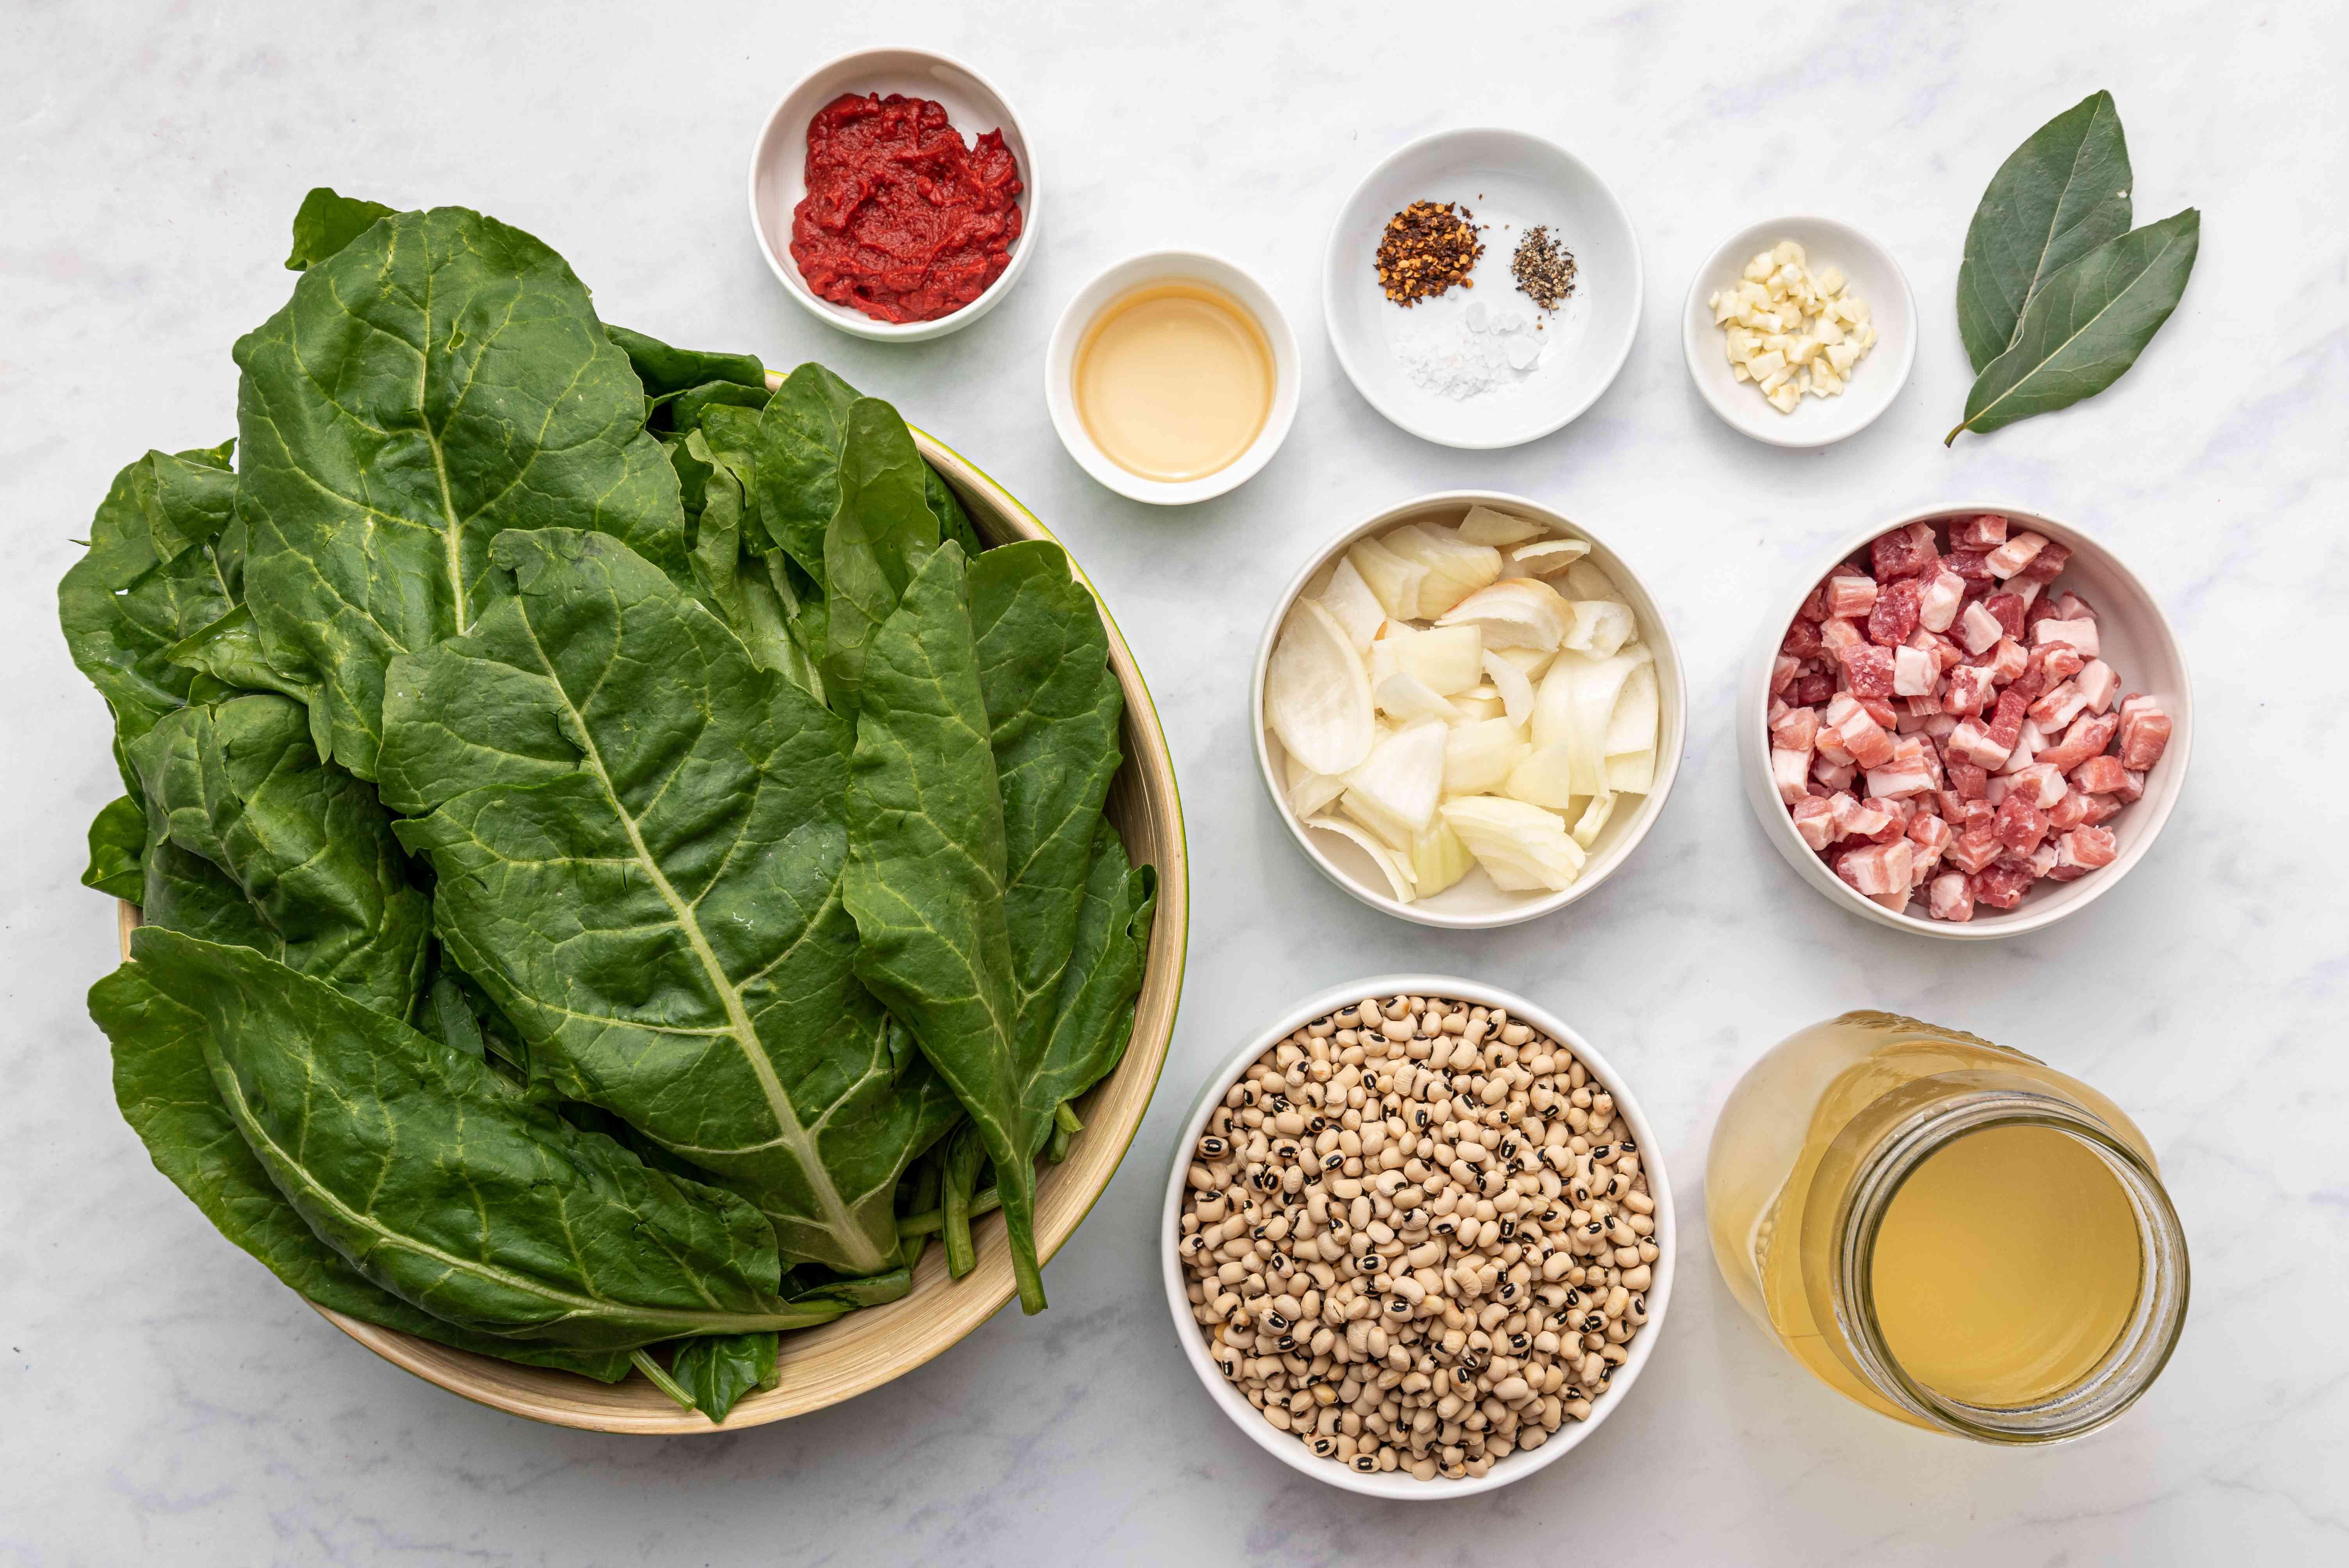 Slow Cooker Black-Eyed Peas and Collard Greens ingredients